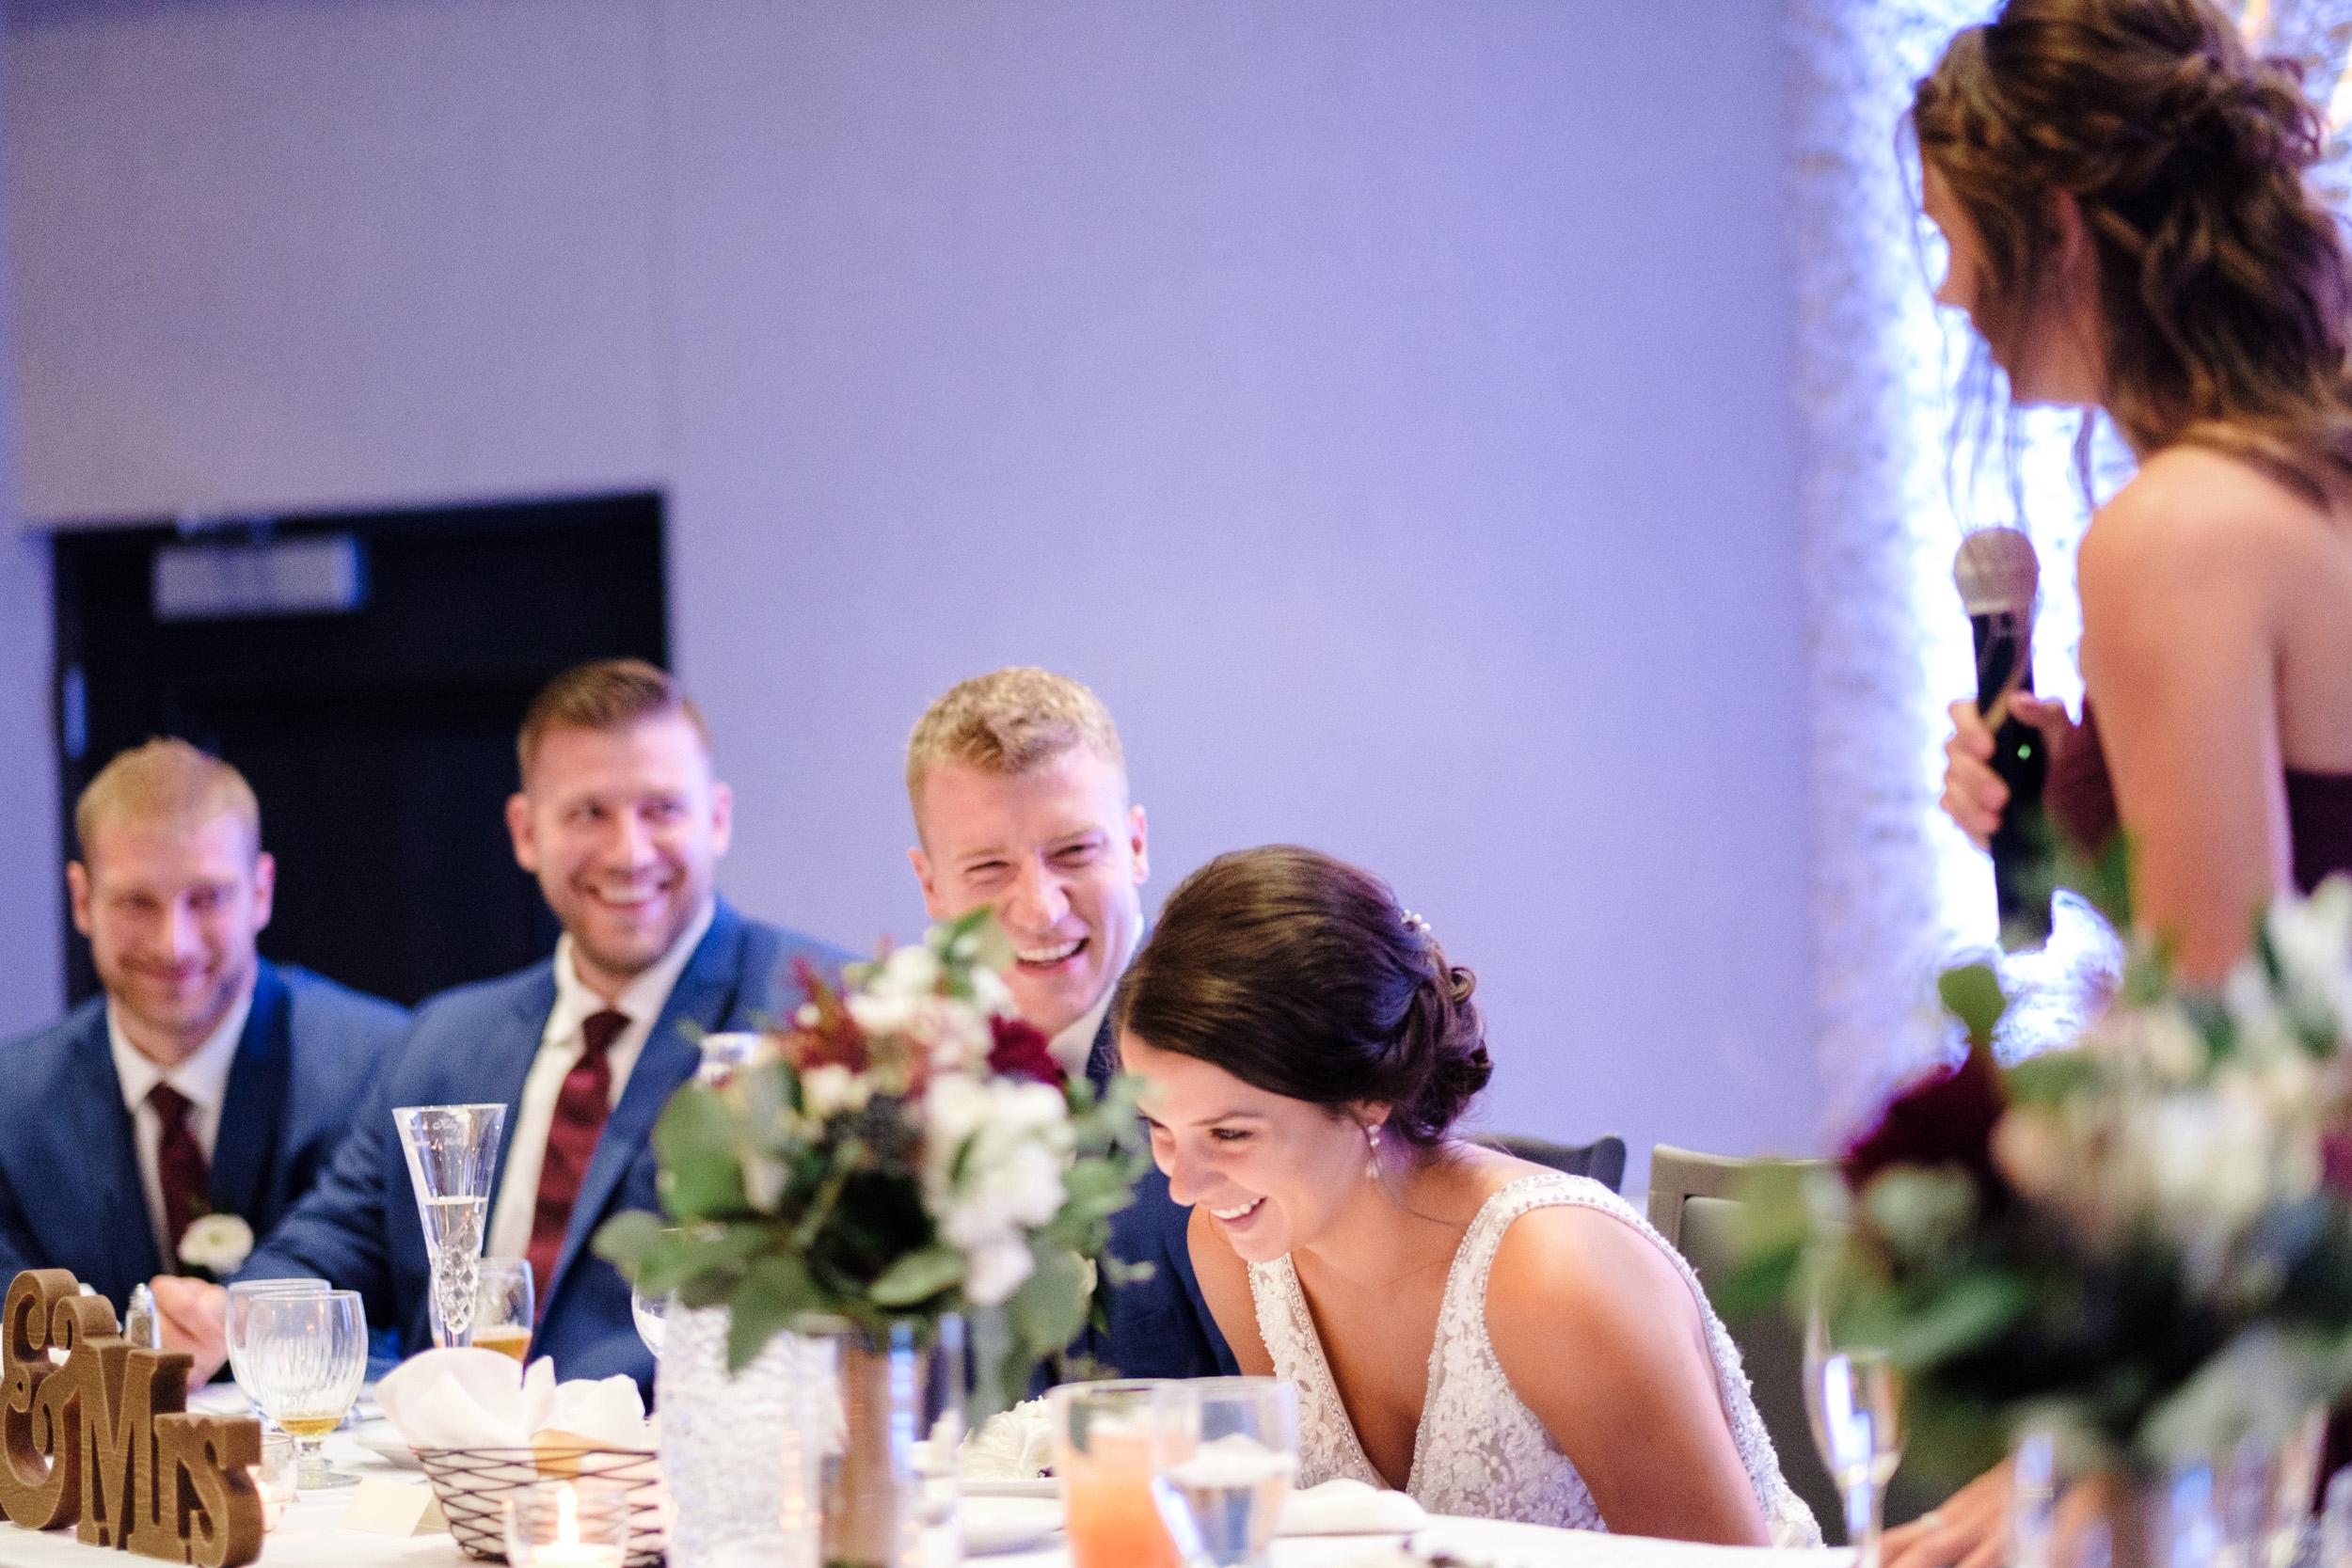 18-09-01 BAP Kiley-Trevor-Anderson-Gardens-Wedding-88.jpg